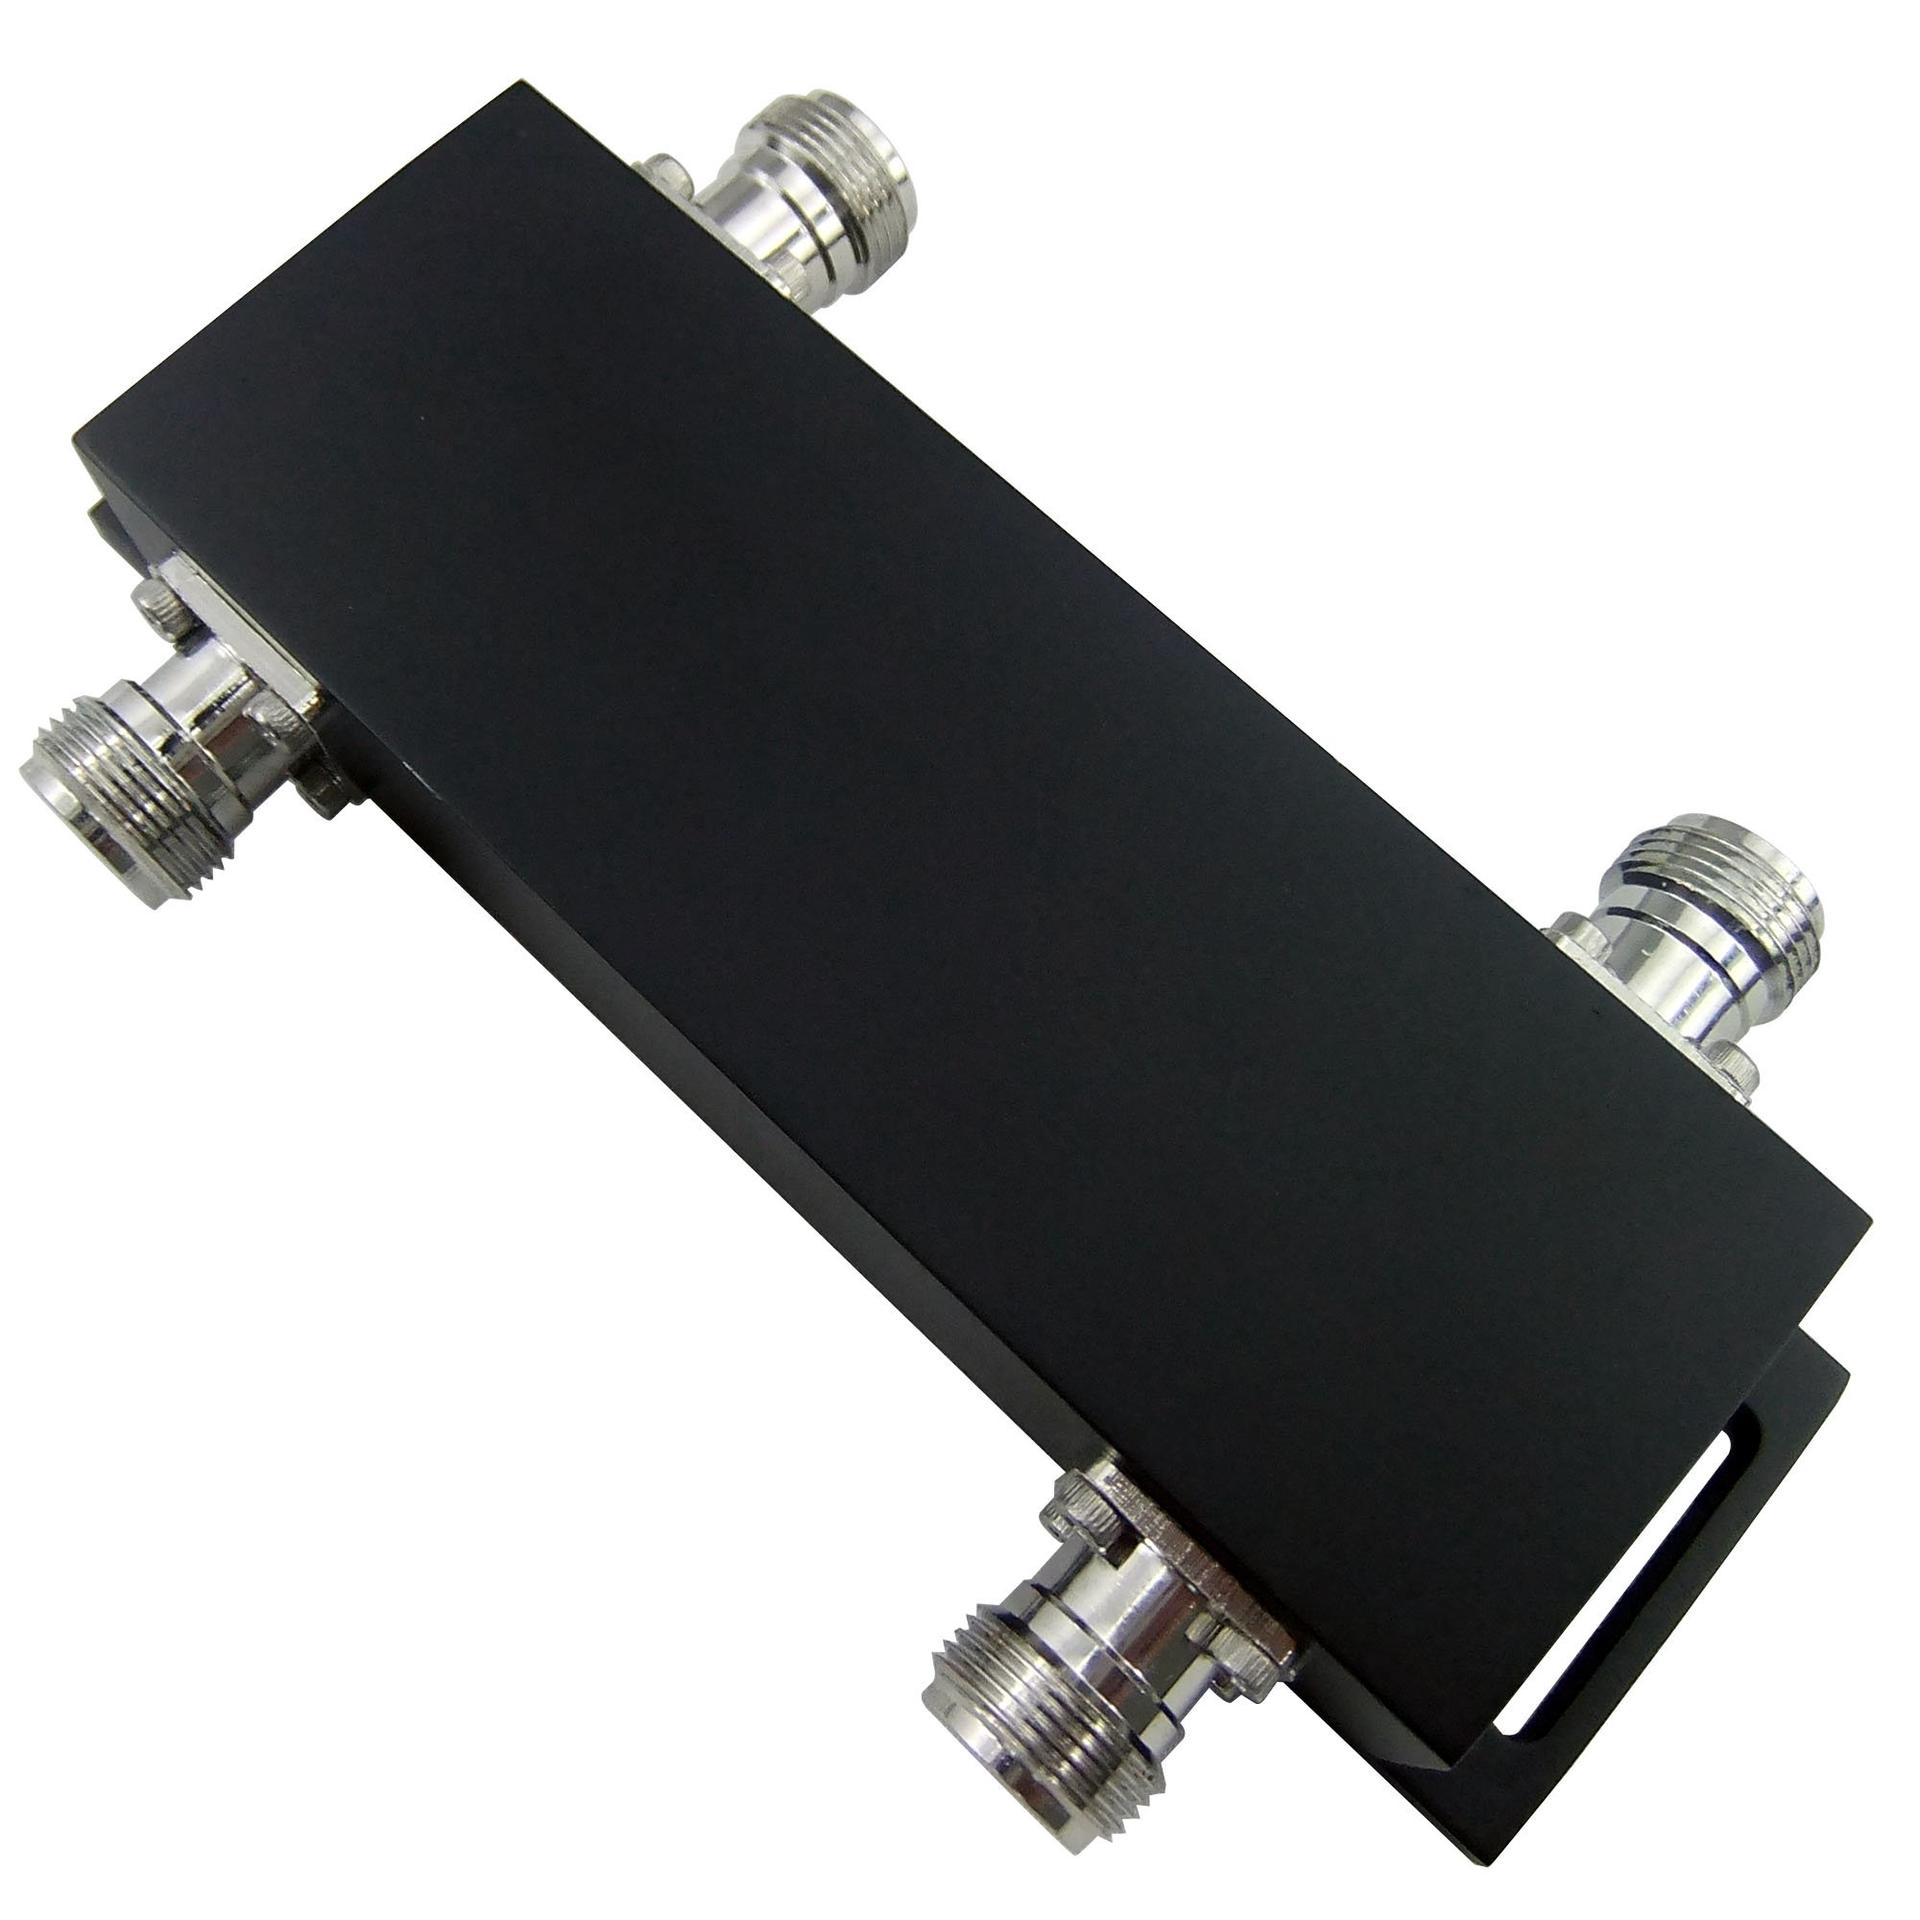 3dB Hybrid Coupler (800-2700MHz)